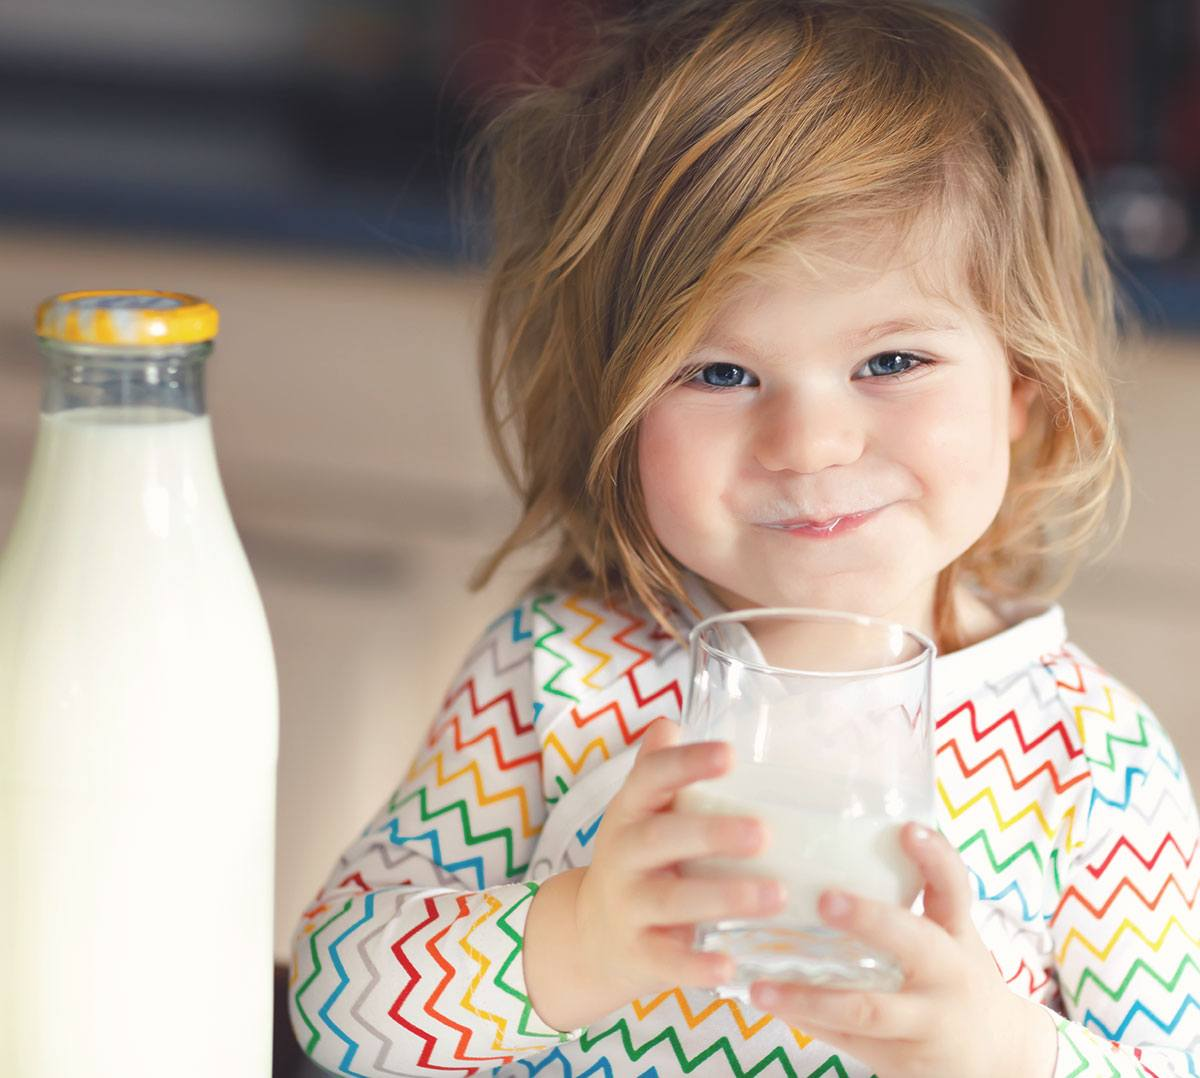 Intolerância à lactose na infância